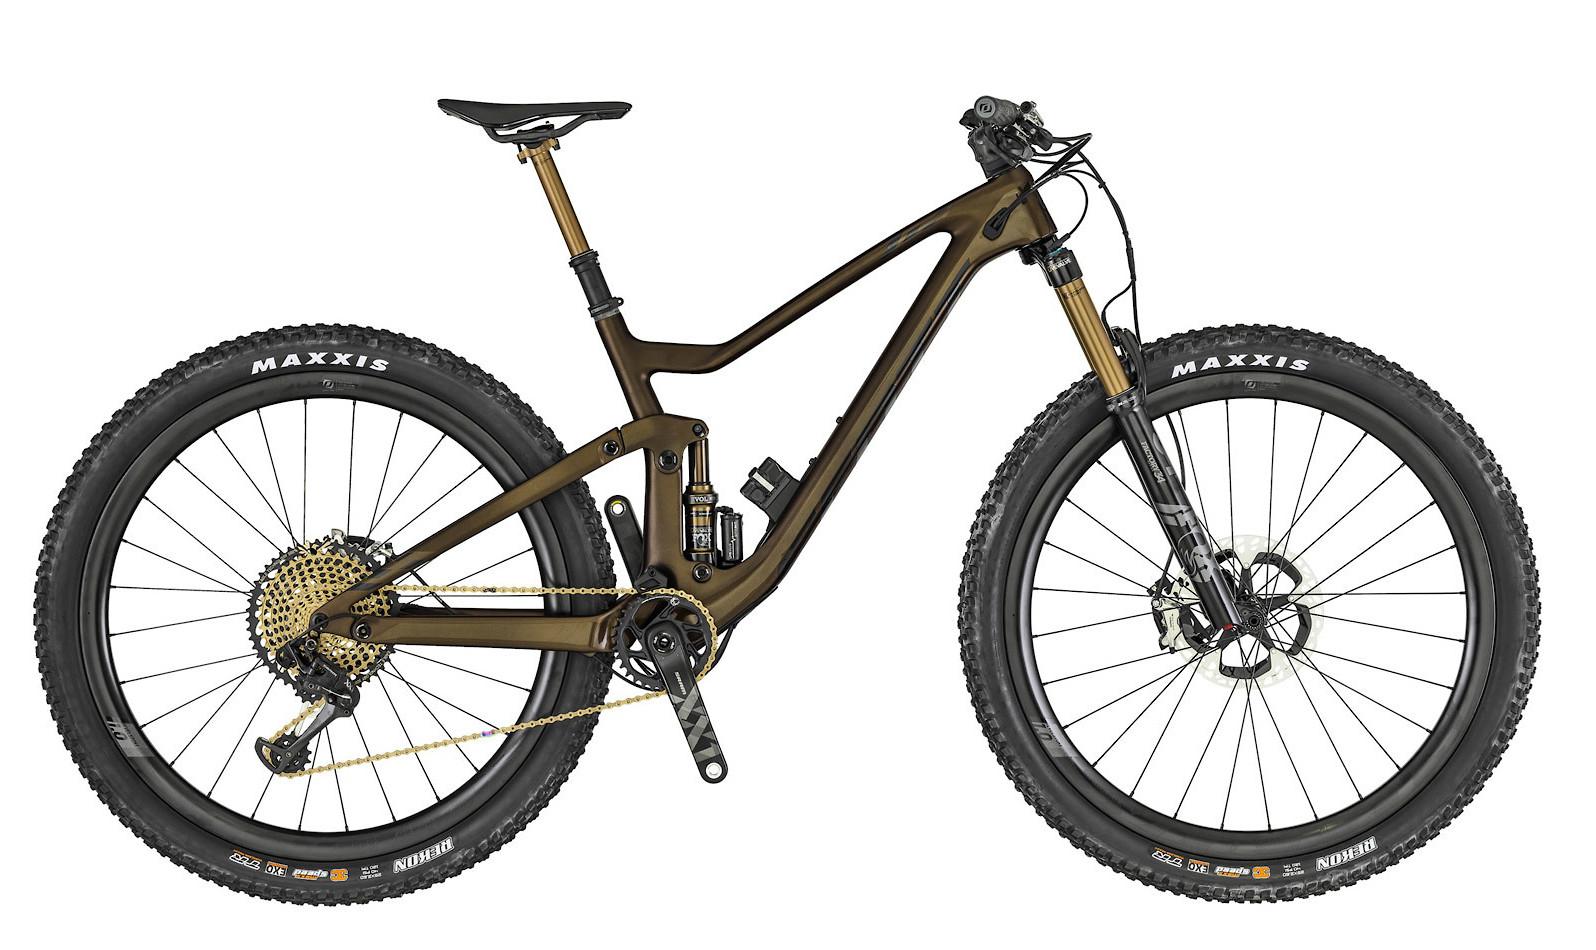 2019 Scott Genius 900 Ultimate Bike - Reviews, Comparisons, Specs